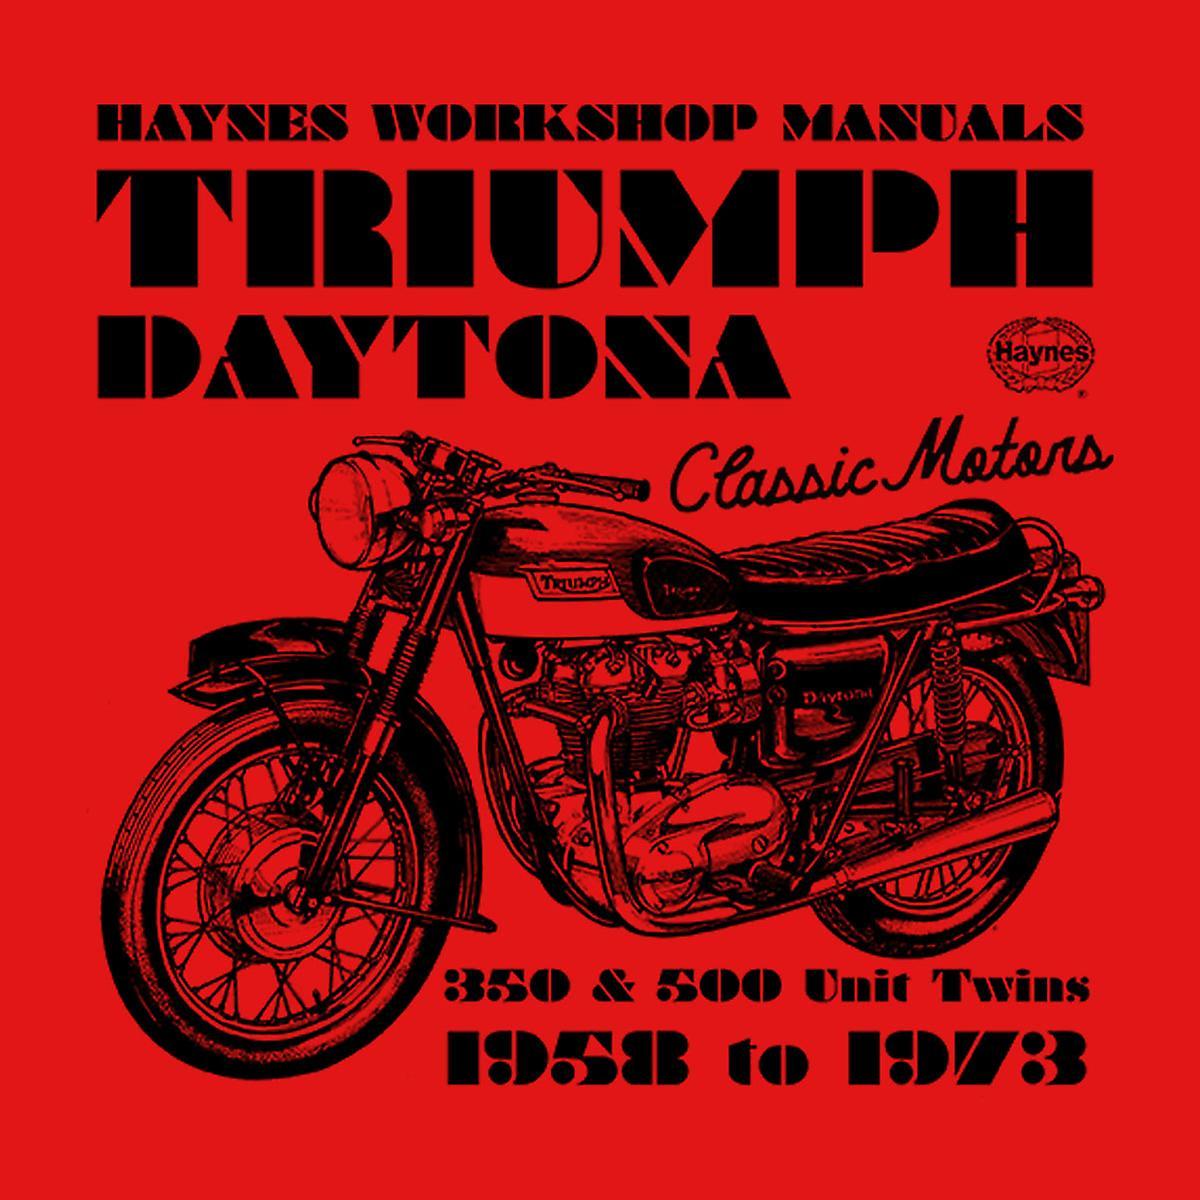 Haynes Owners Workshop Manual Triumph Daytona 350 500 Varsity jas voor mannen